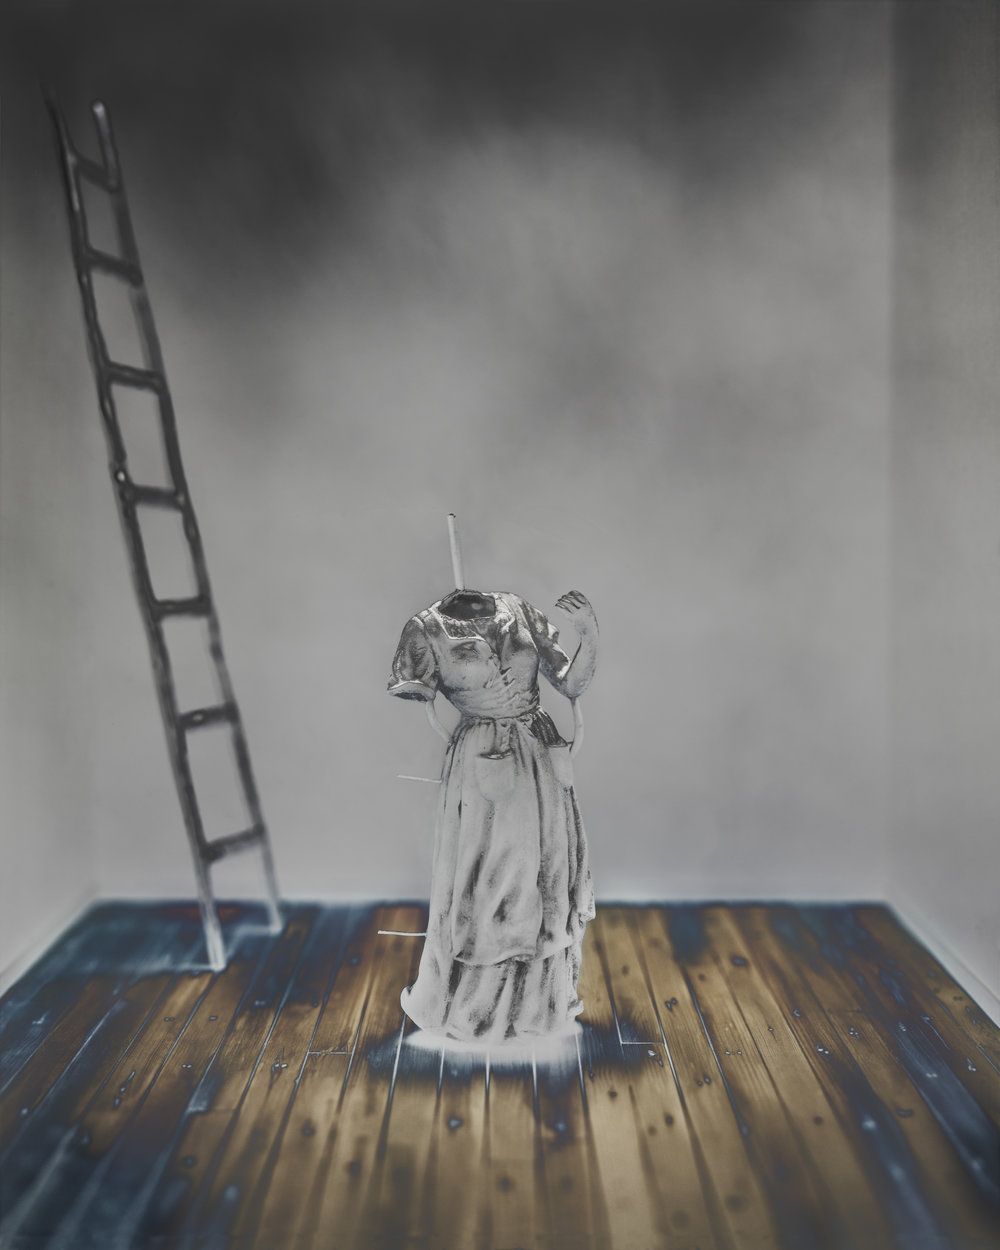 Denise Grünstein   EXIT, 2018  C-Print  80 x 64 cm Edition 3 + 2 AP  40 x 32 cm Edition 6 + 2 AP